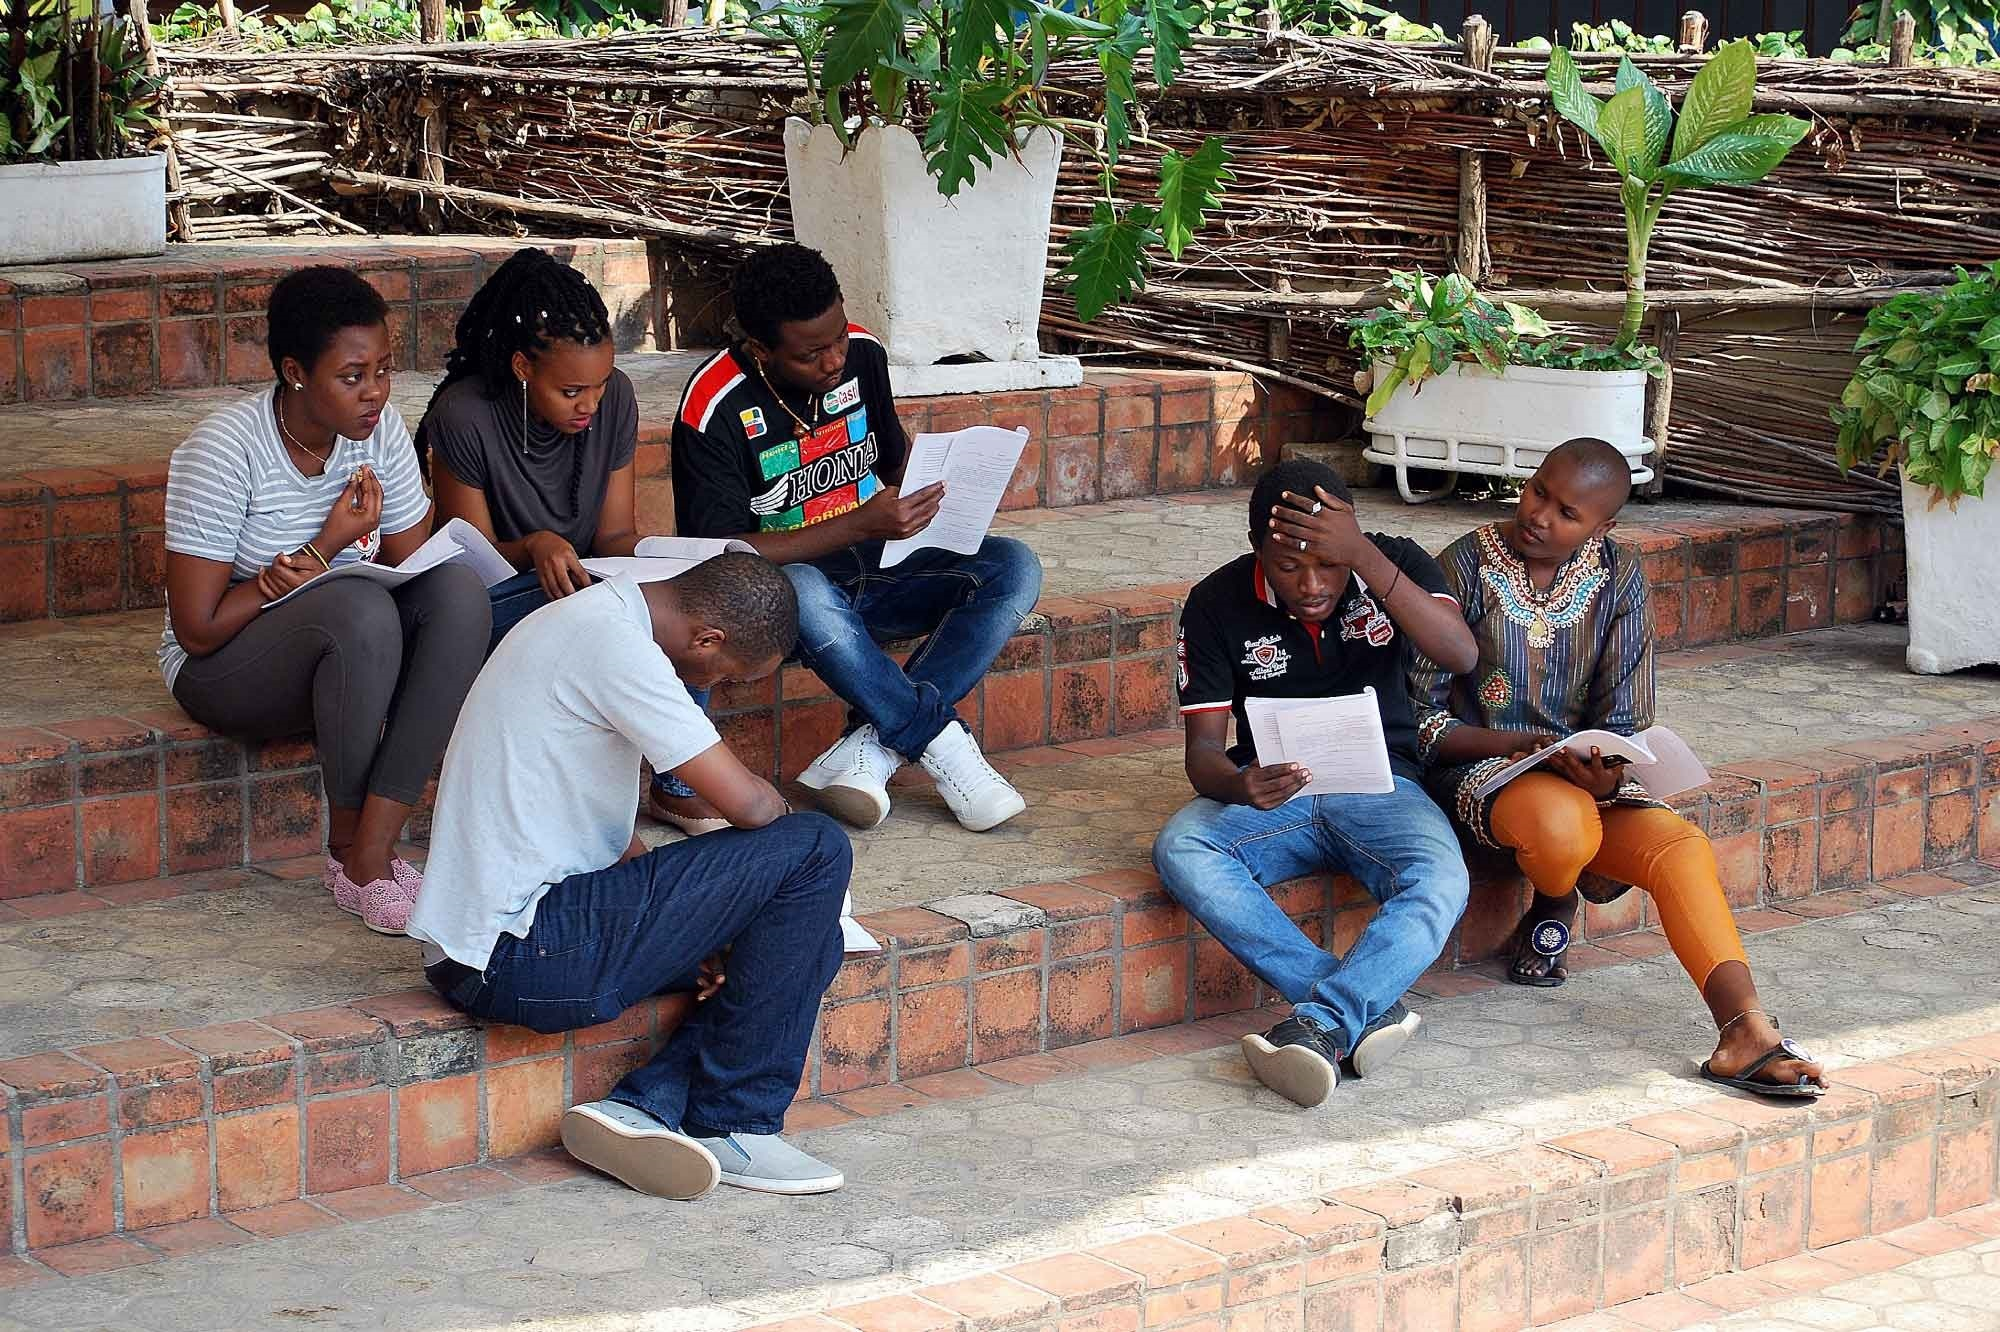 Workshop-Comédie-Humaine-JUN-2017-Bujumbura-c-Johannes-Nix-15